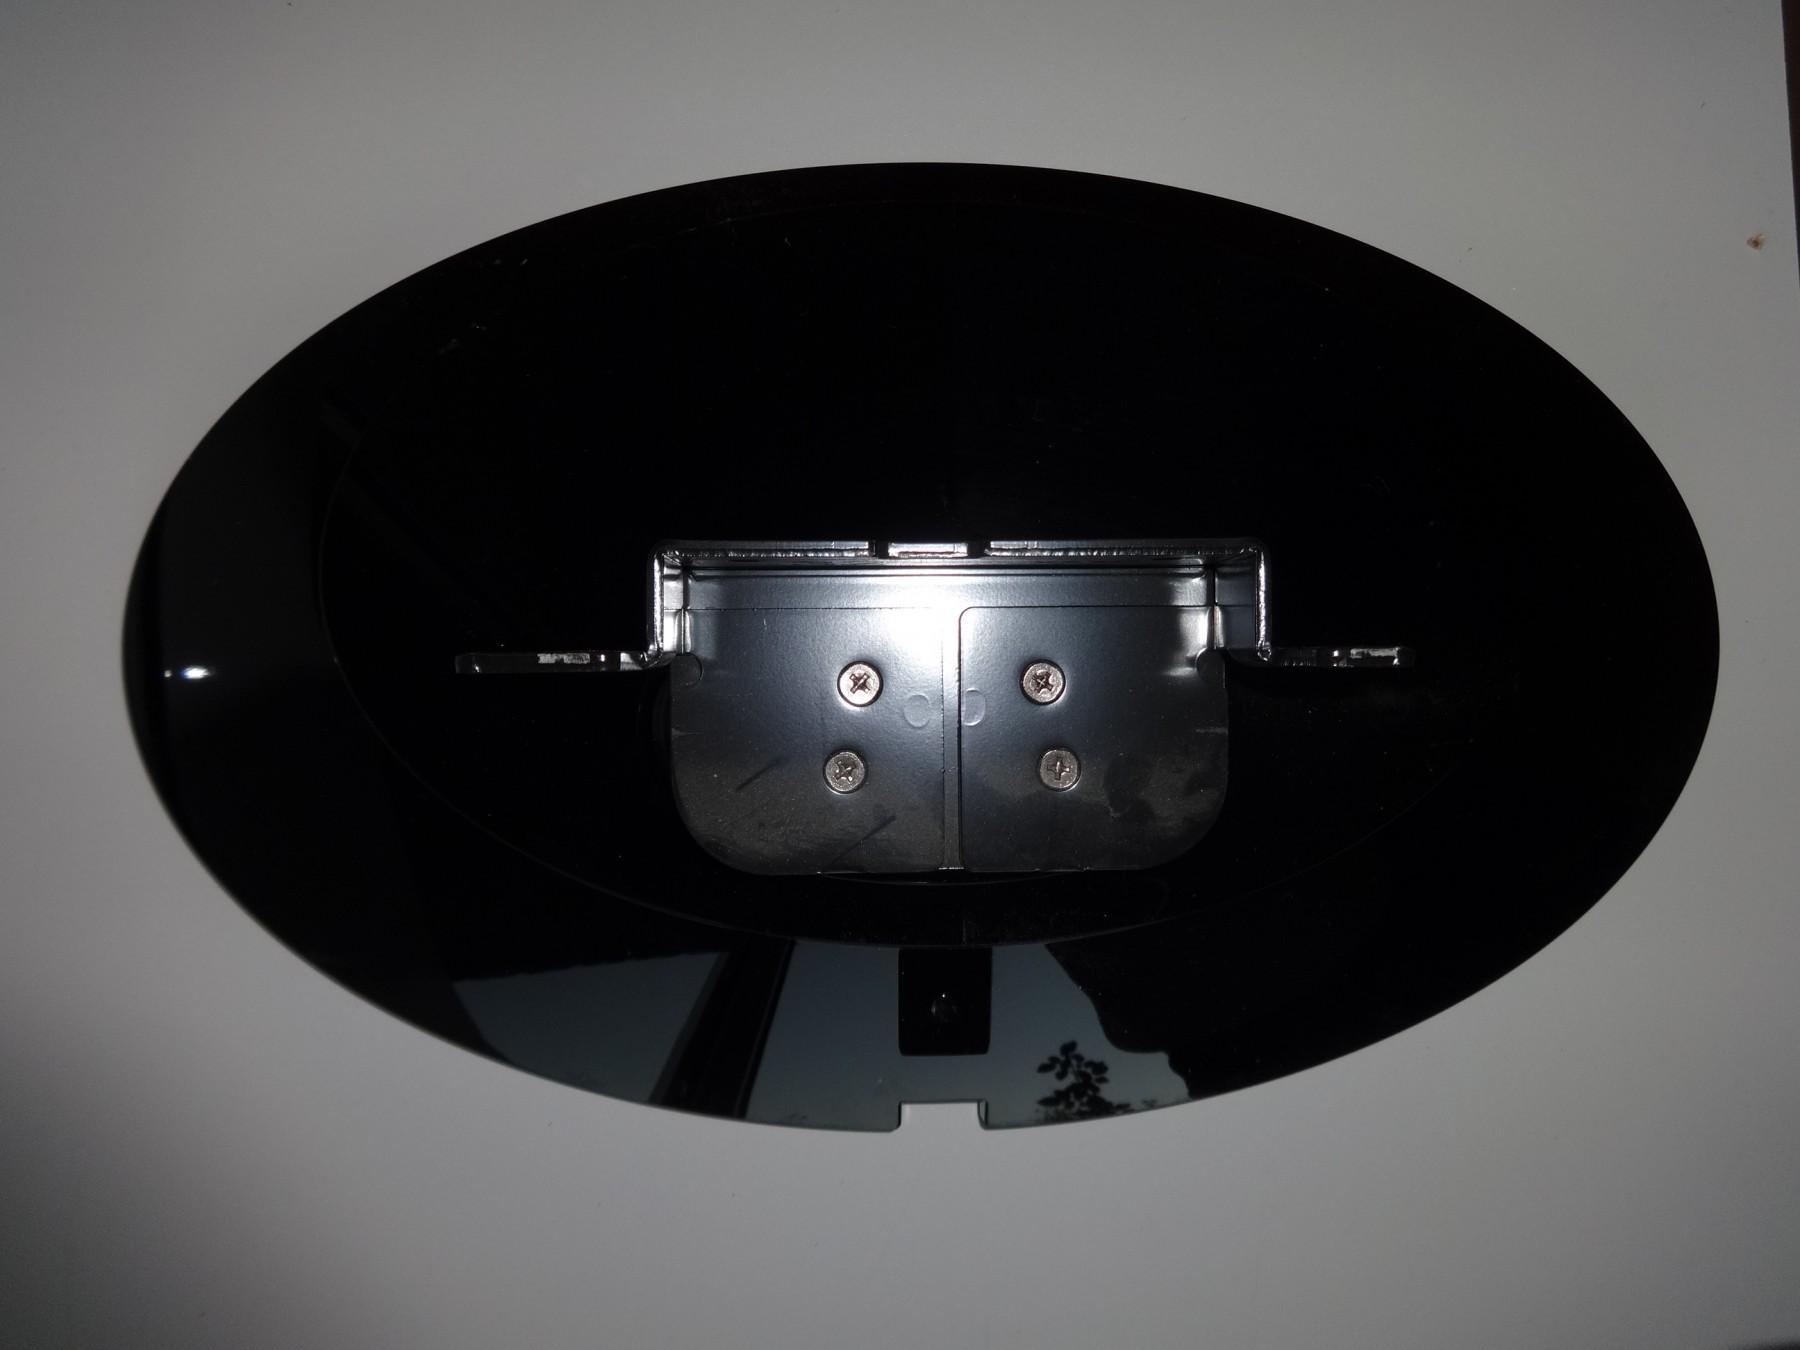 Стойка TABLETOP/BASE STAND FOR PANASONIC TUXA325